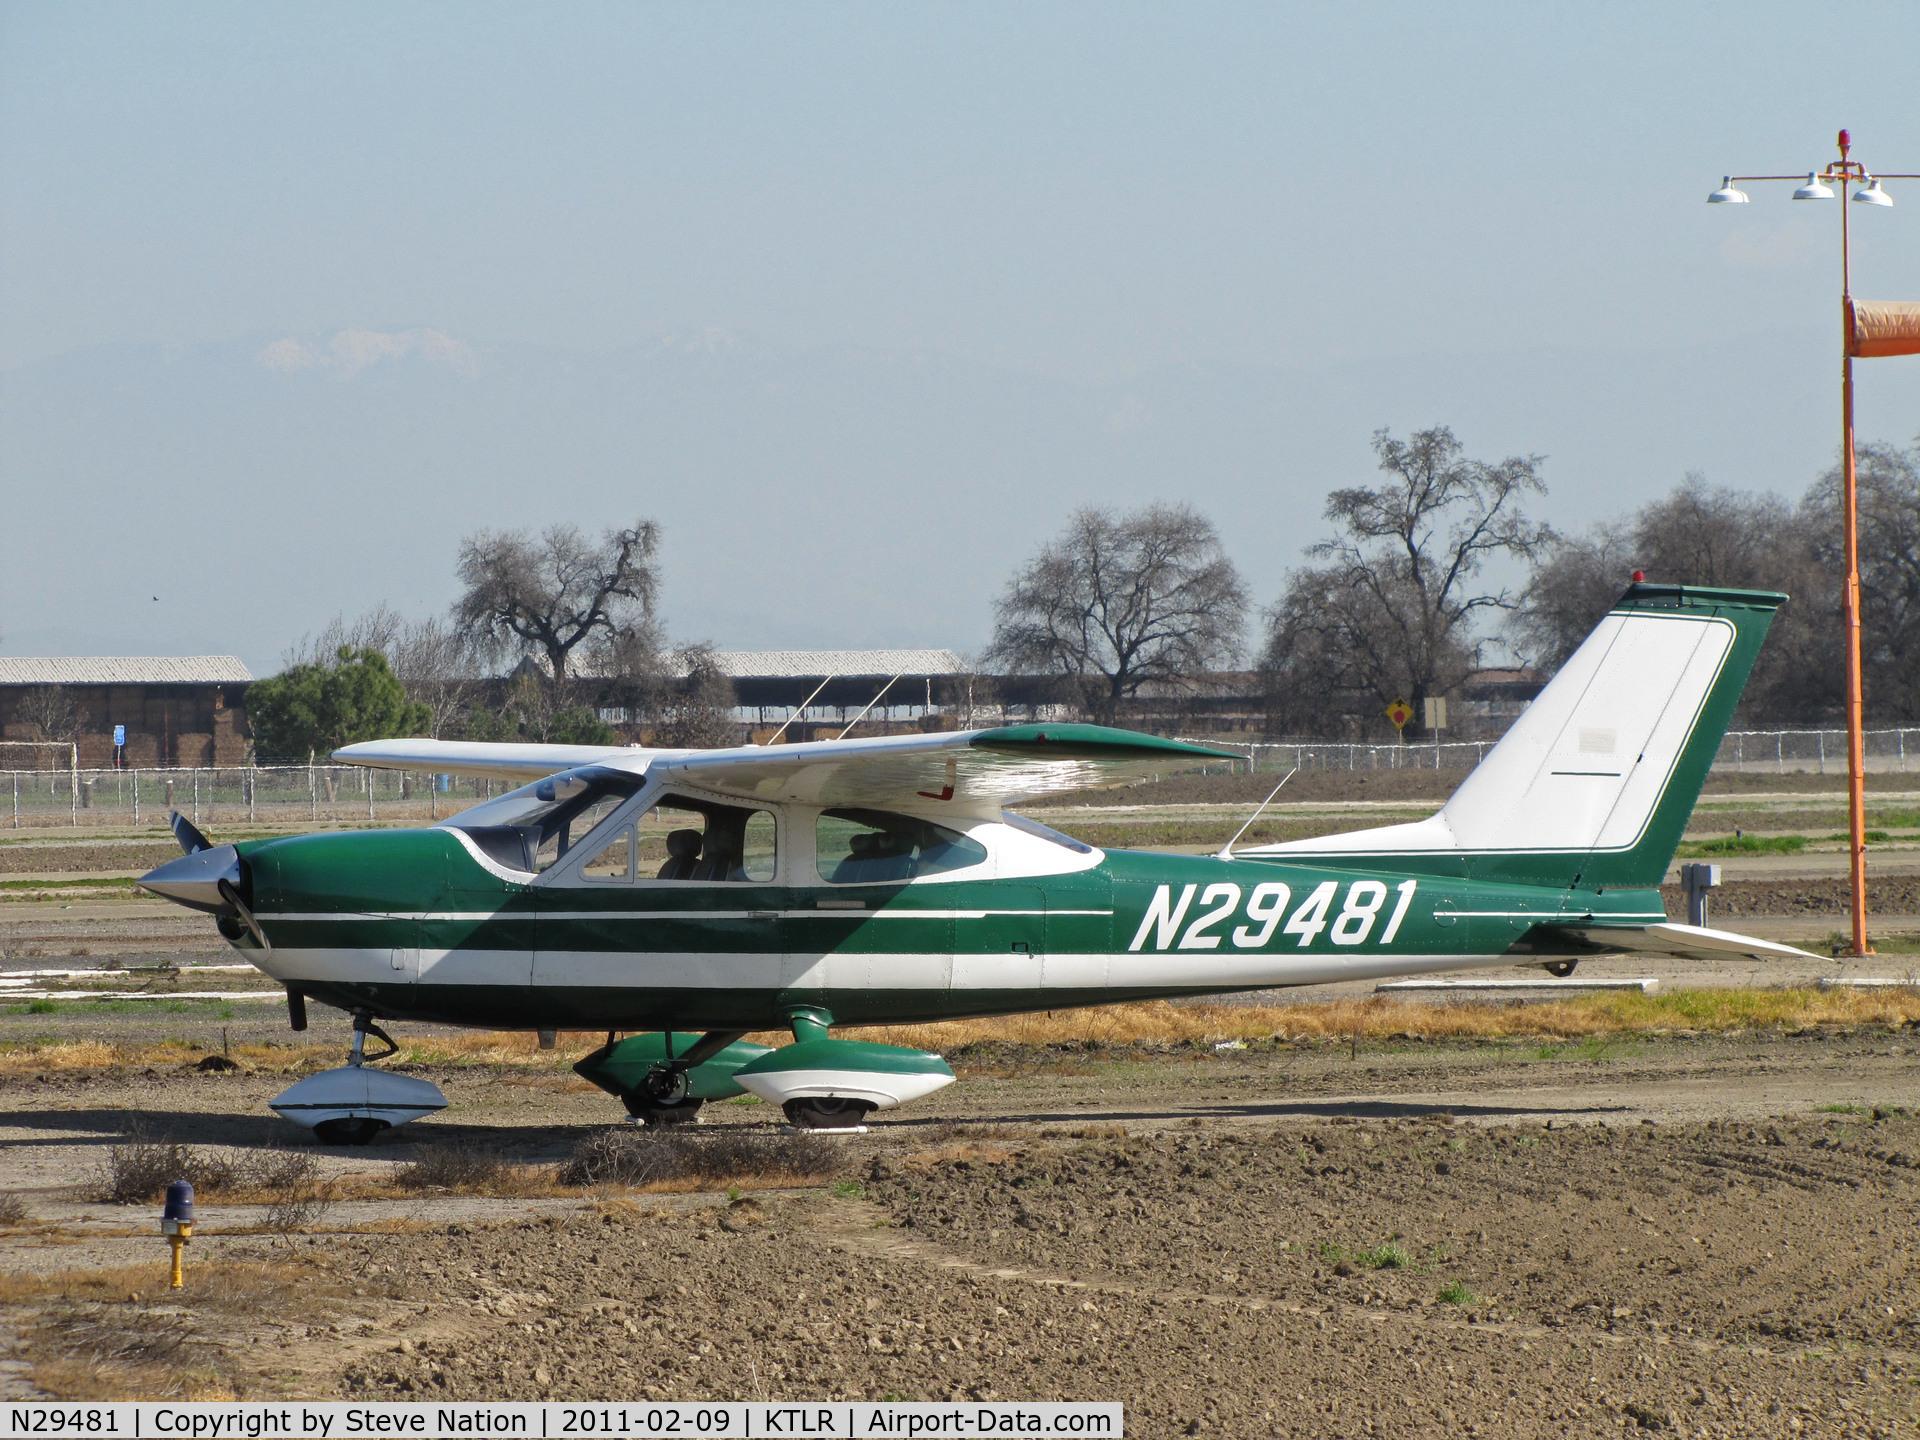 N29481, 1968 Cessna 177 Cardinal C/N 17700916, 1968 Cessna 177 Cardinal @ Tulare, CA